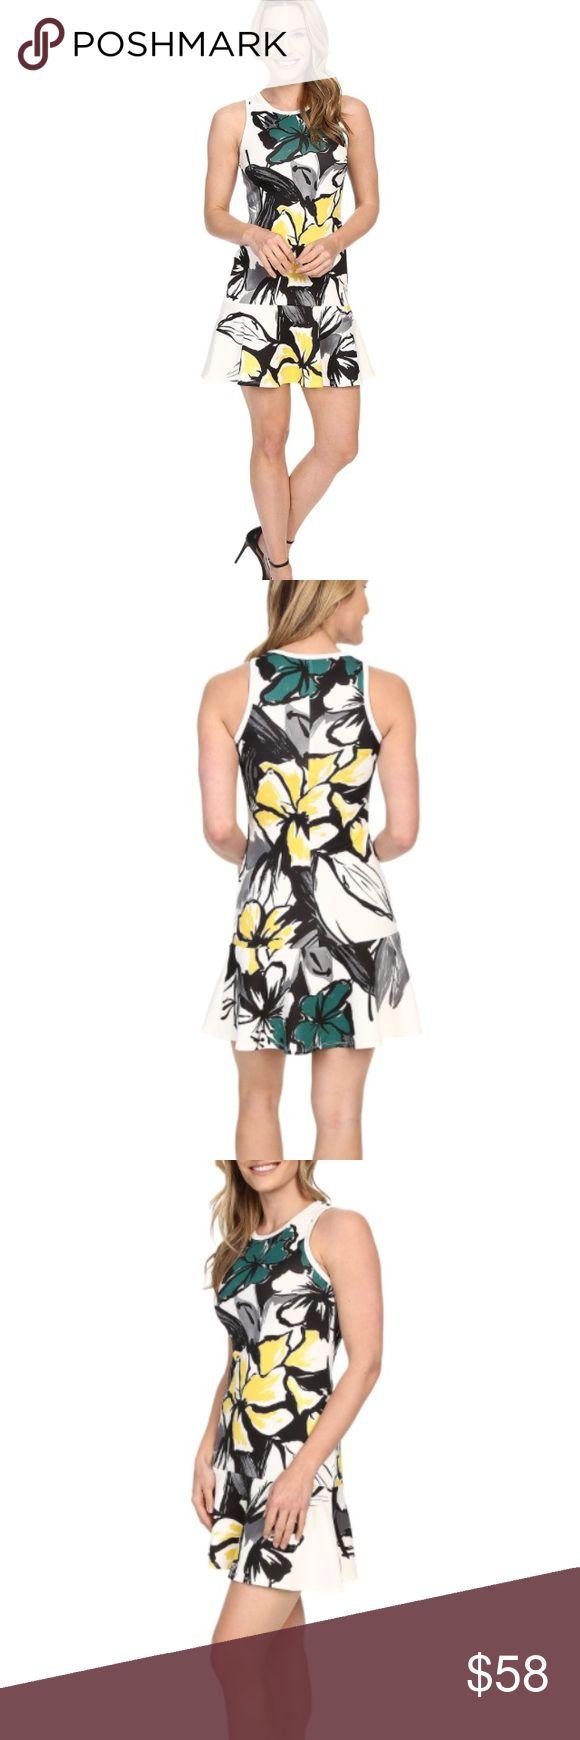 SALE❤️ NWT Karen Kane floral scuba dress M NWT Karen Kane floral print scuba dress size medium. Karen Kane Dresses